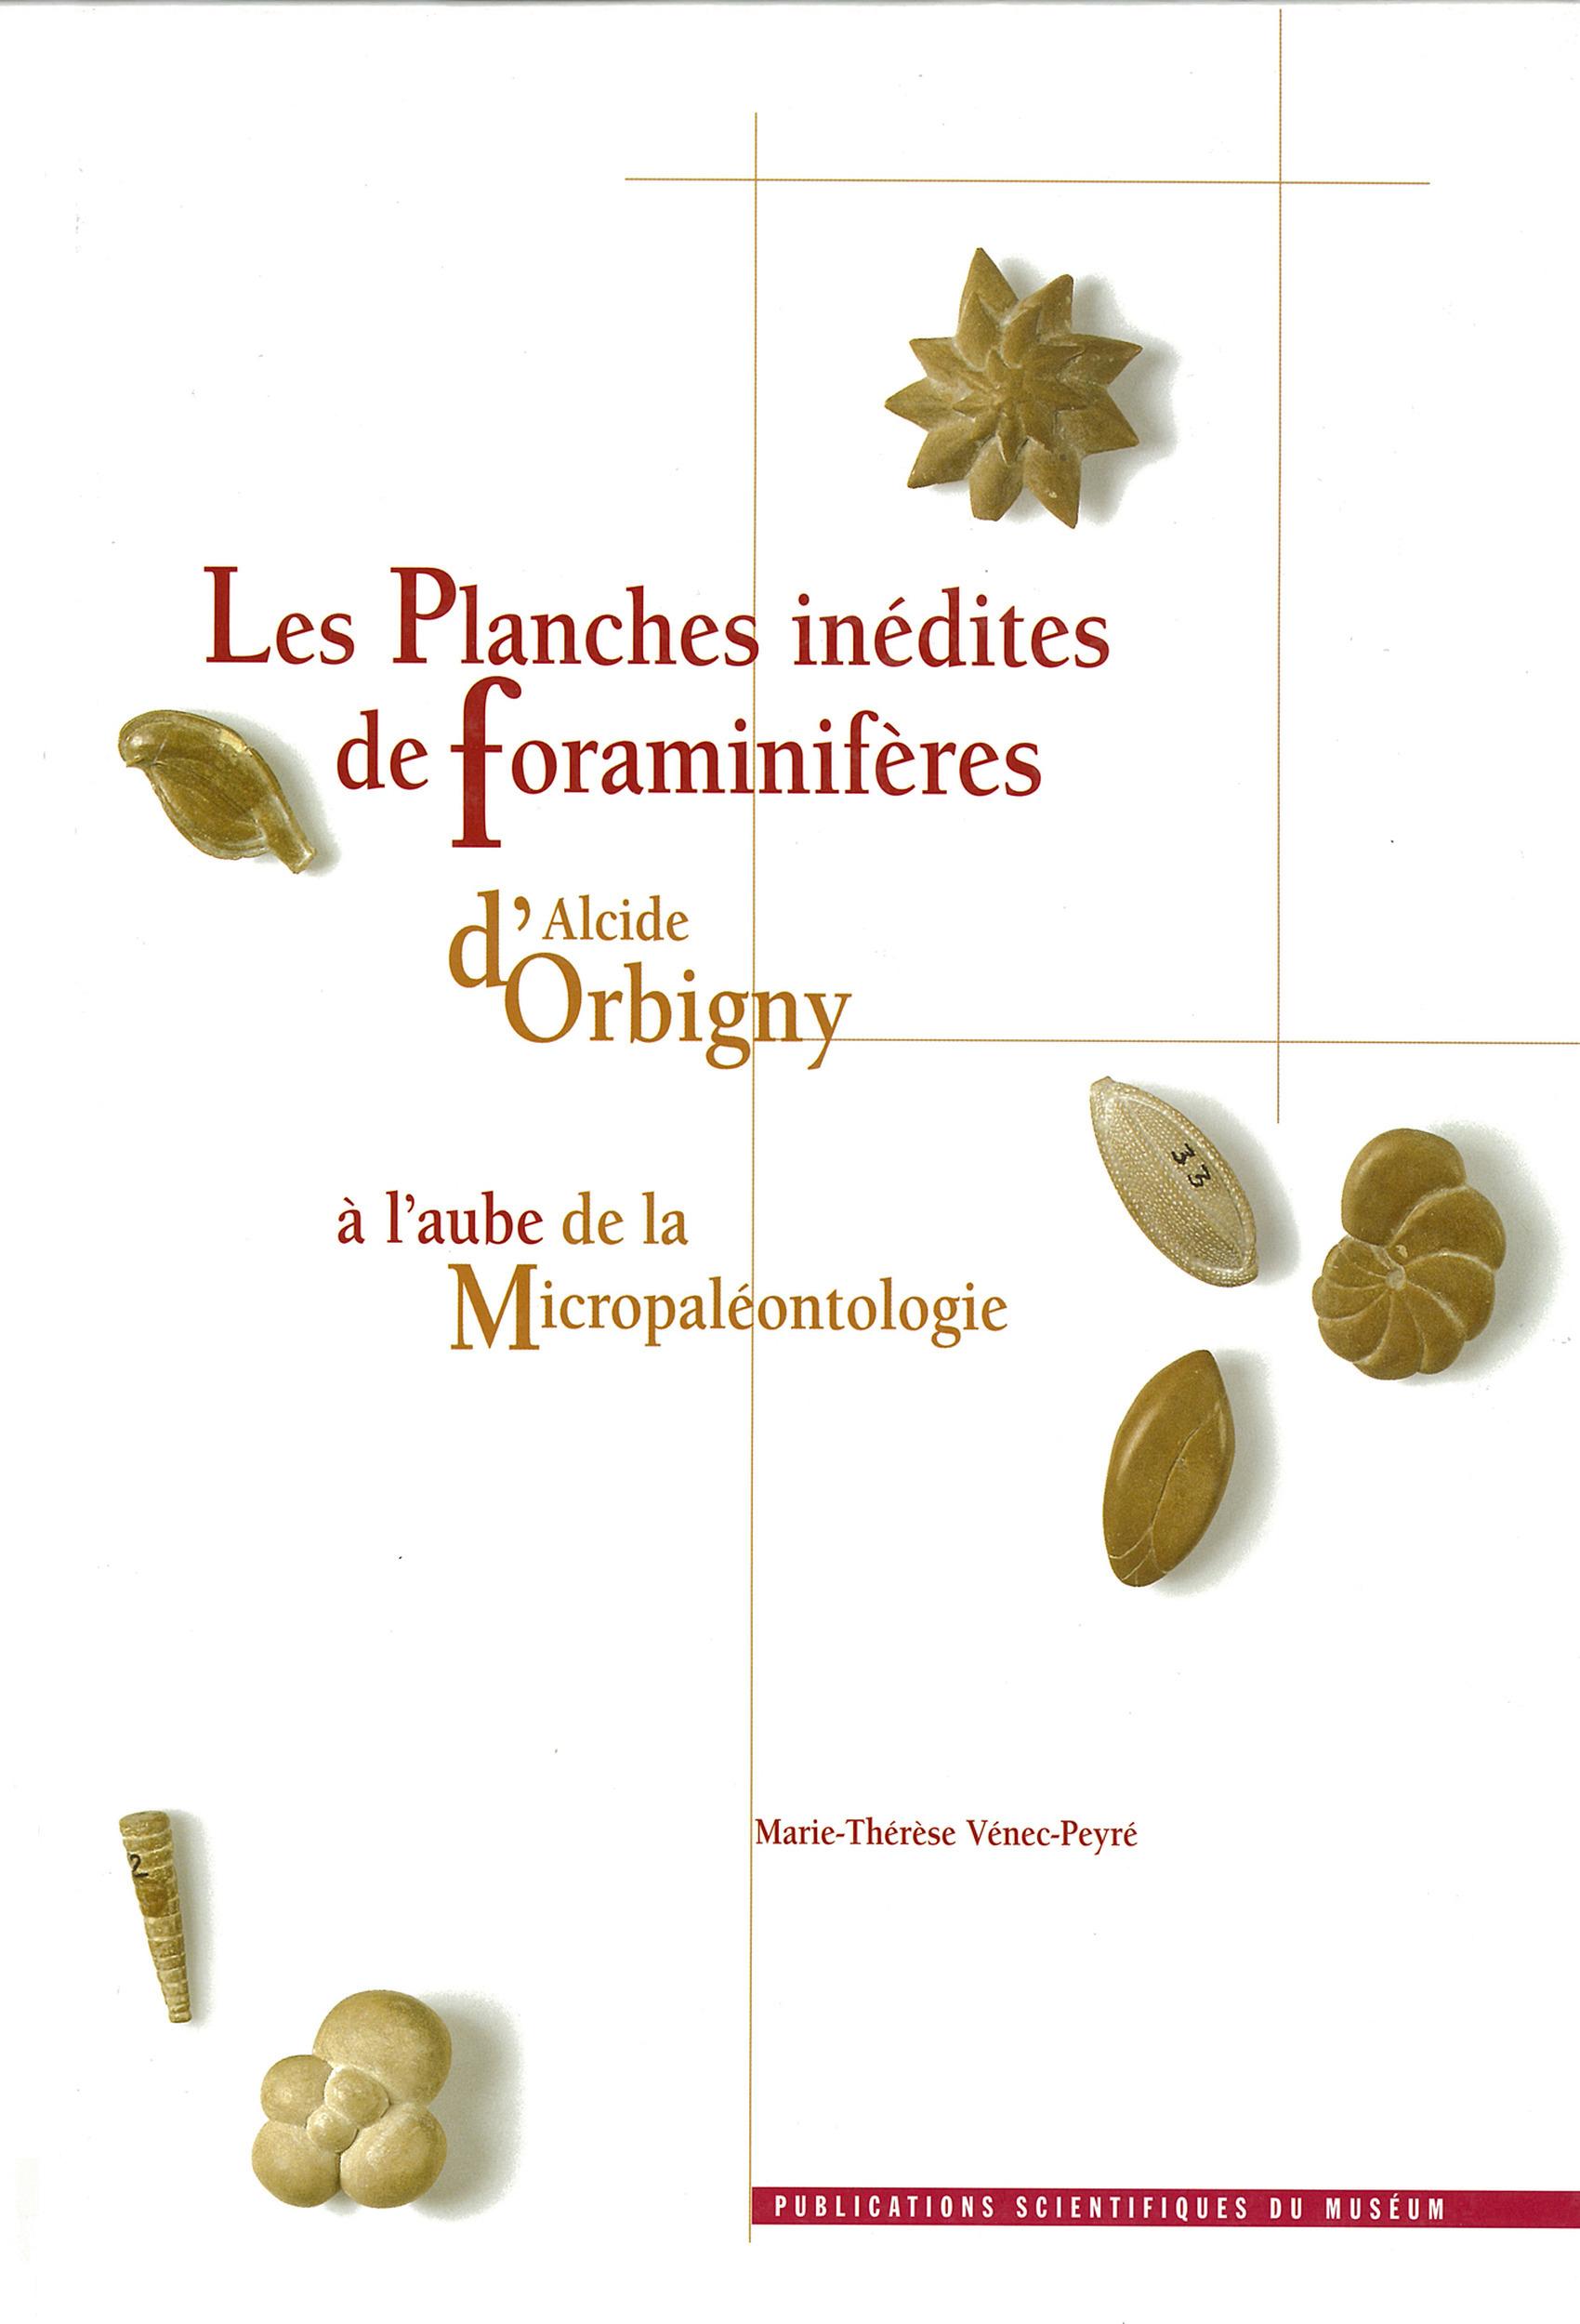 Les Planches inédites de Foraminifères d´Alcide d'Orbigny